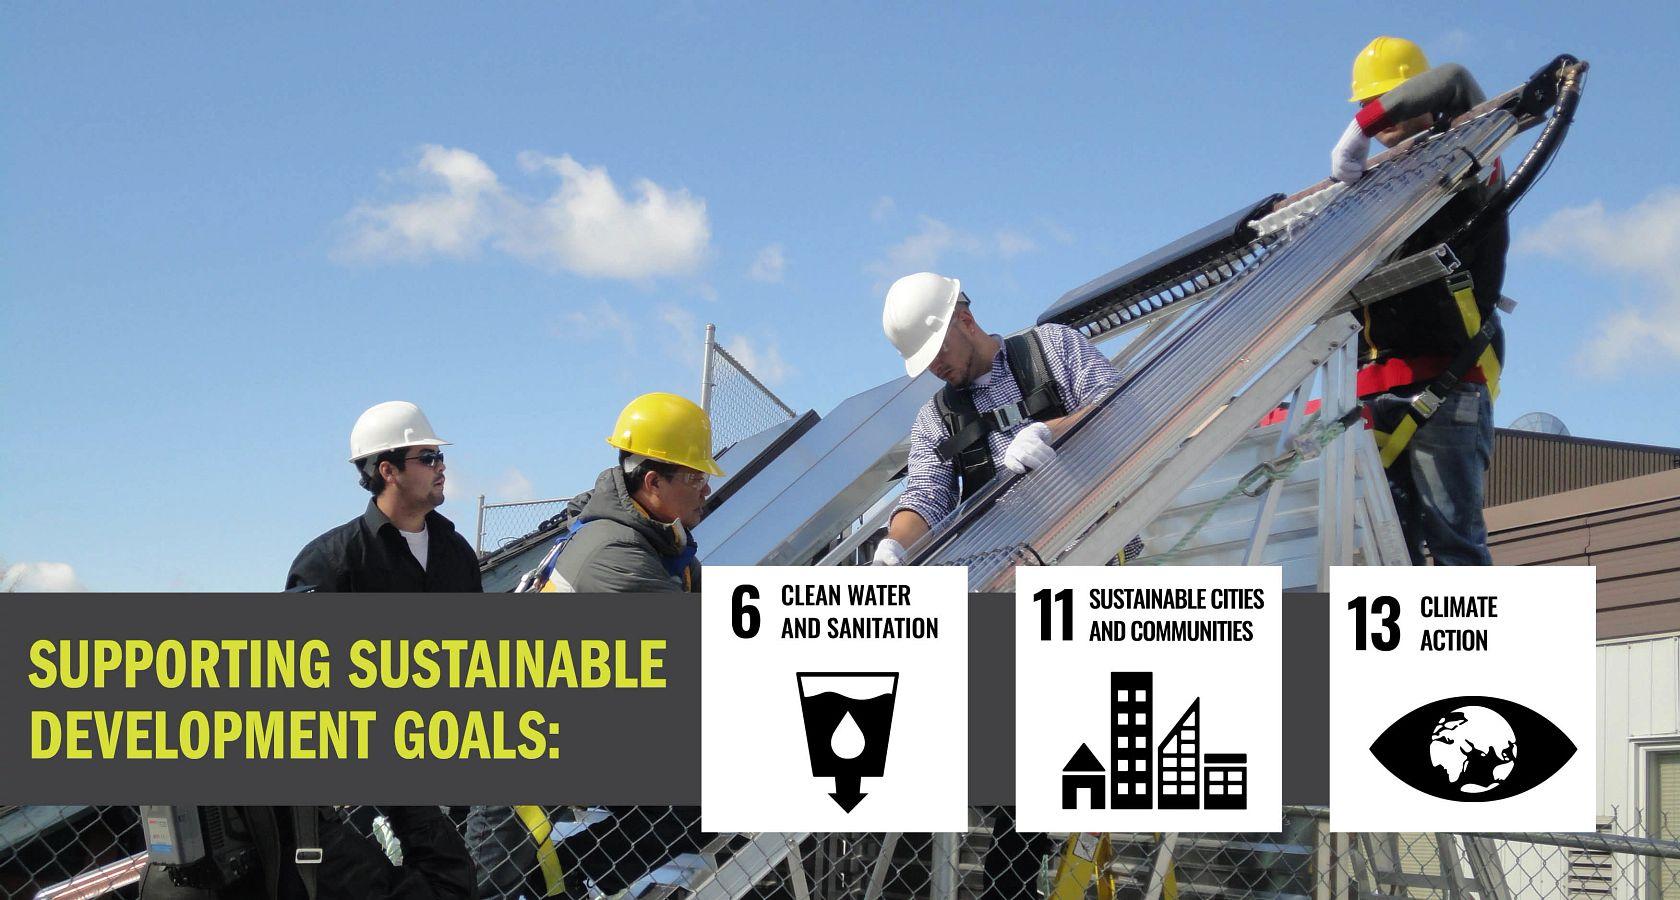 sustainability-energy-water.jpg